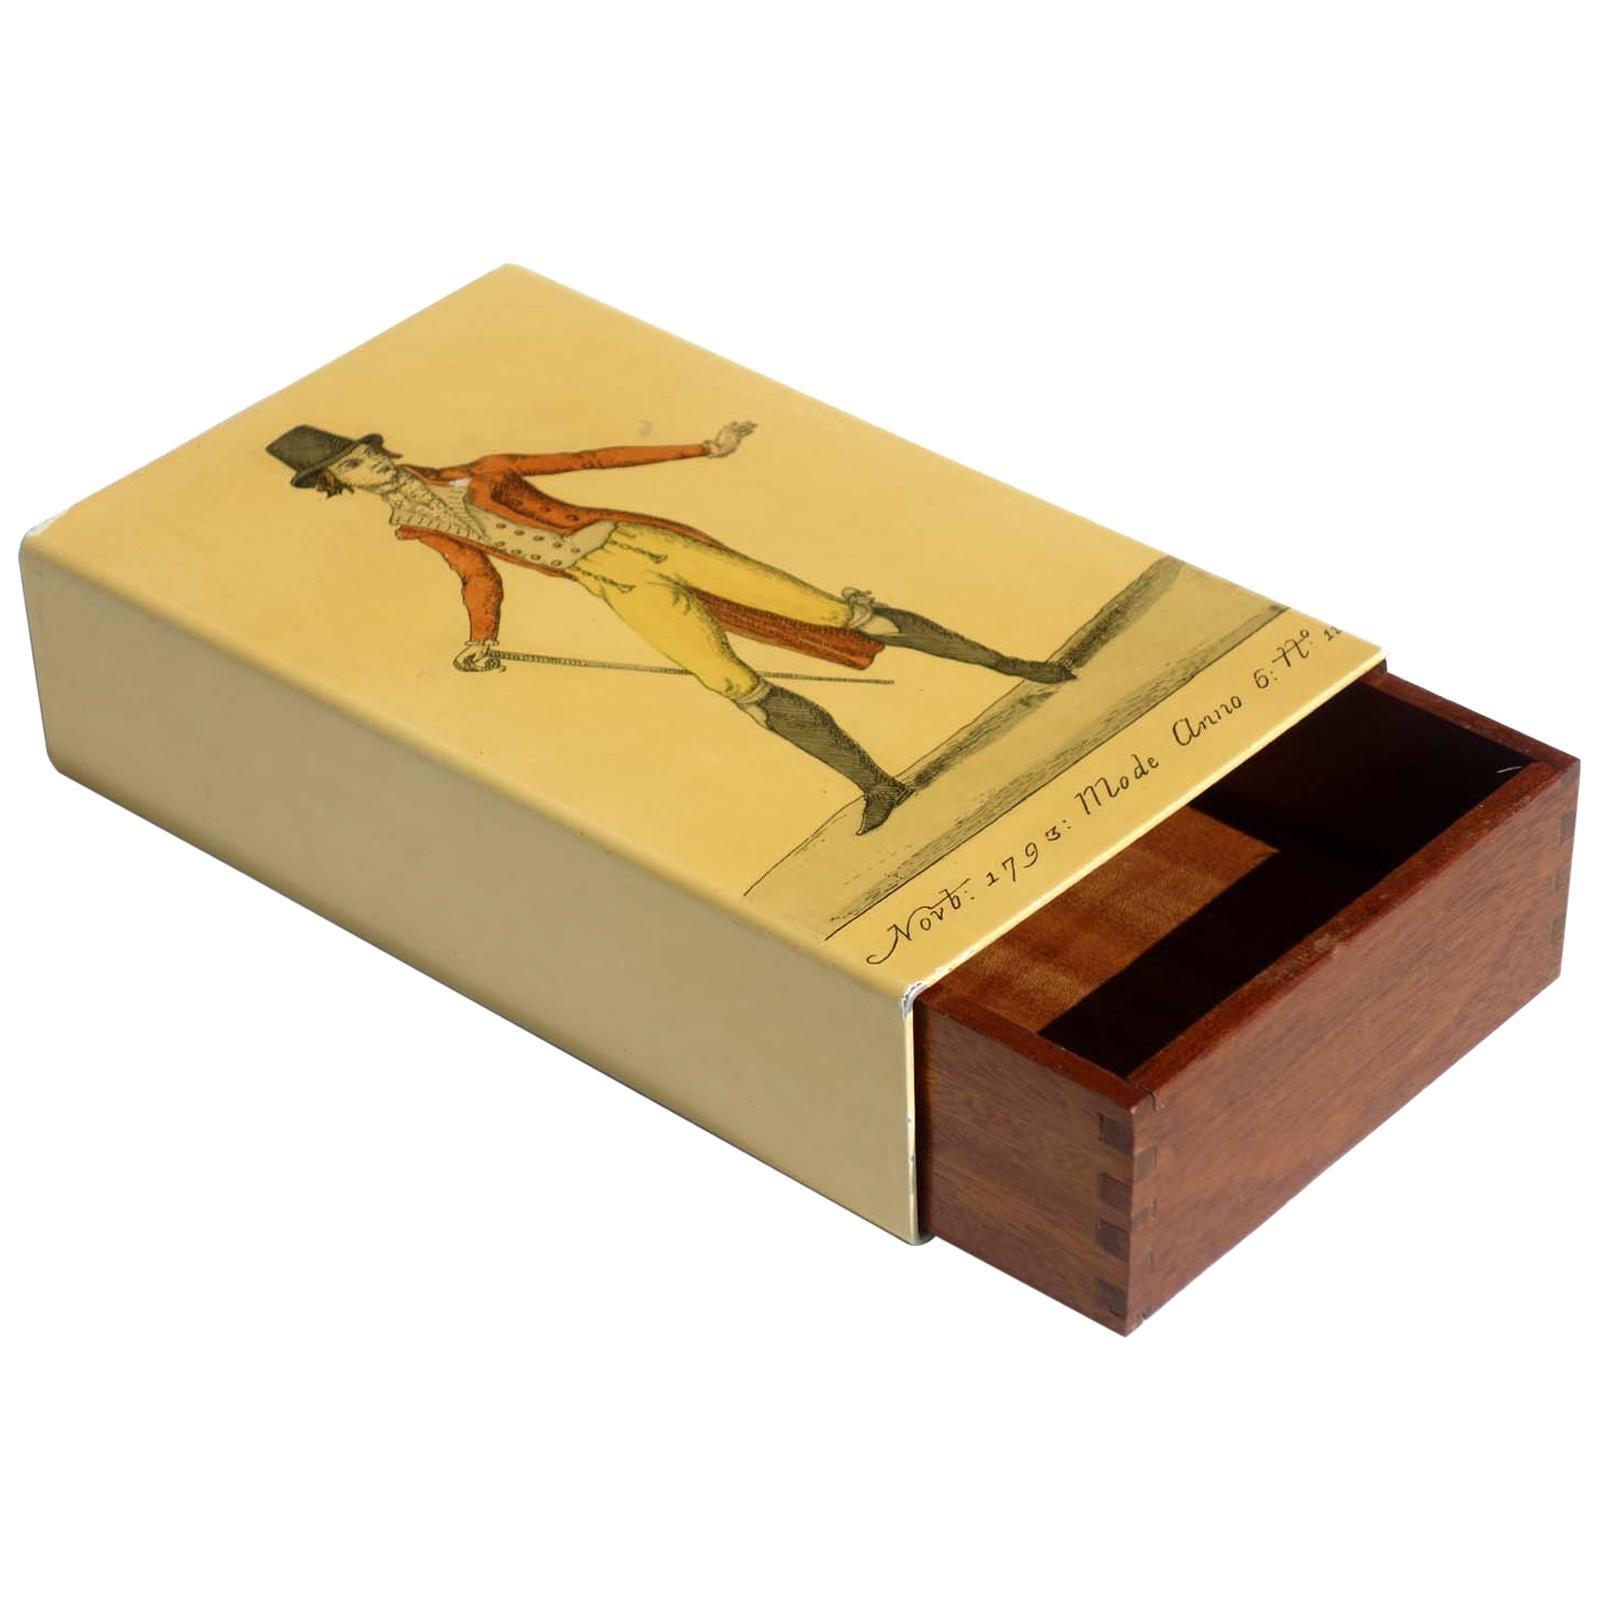 1950s by Piero Fornasetti Midcentury Italian Design Metal Box